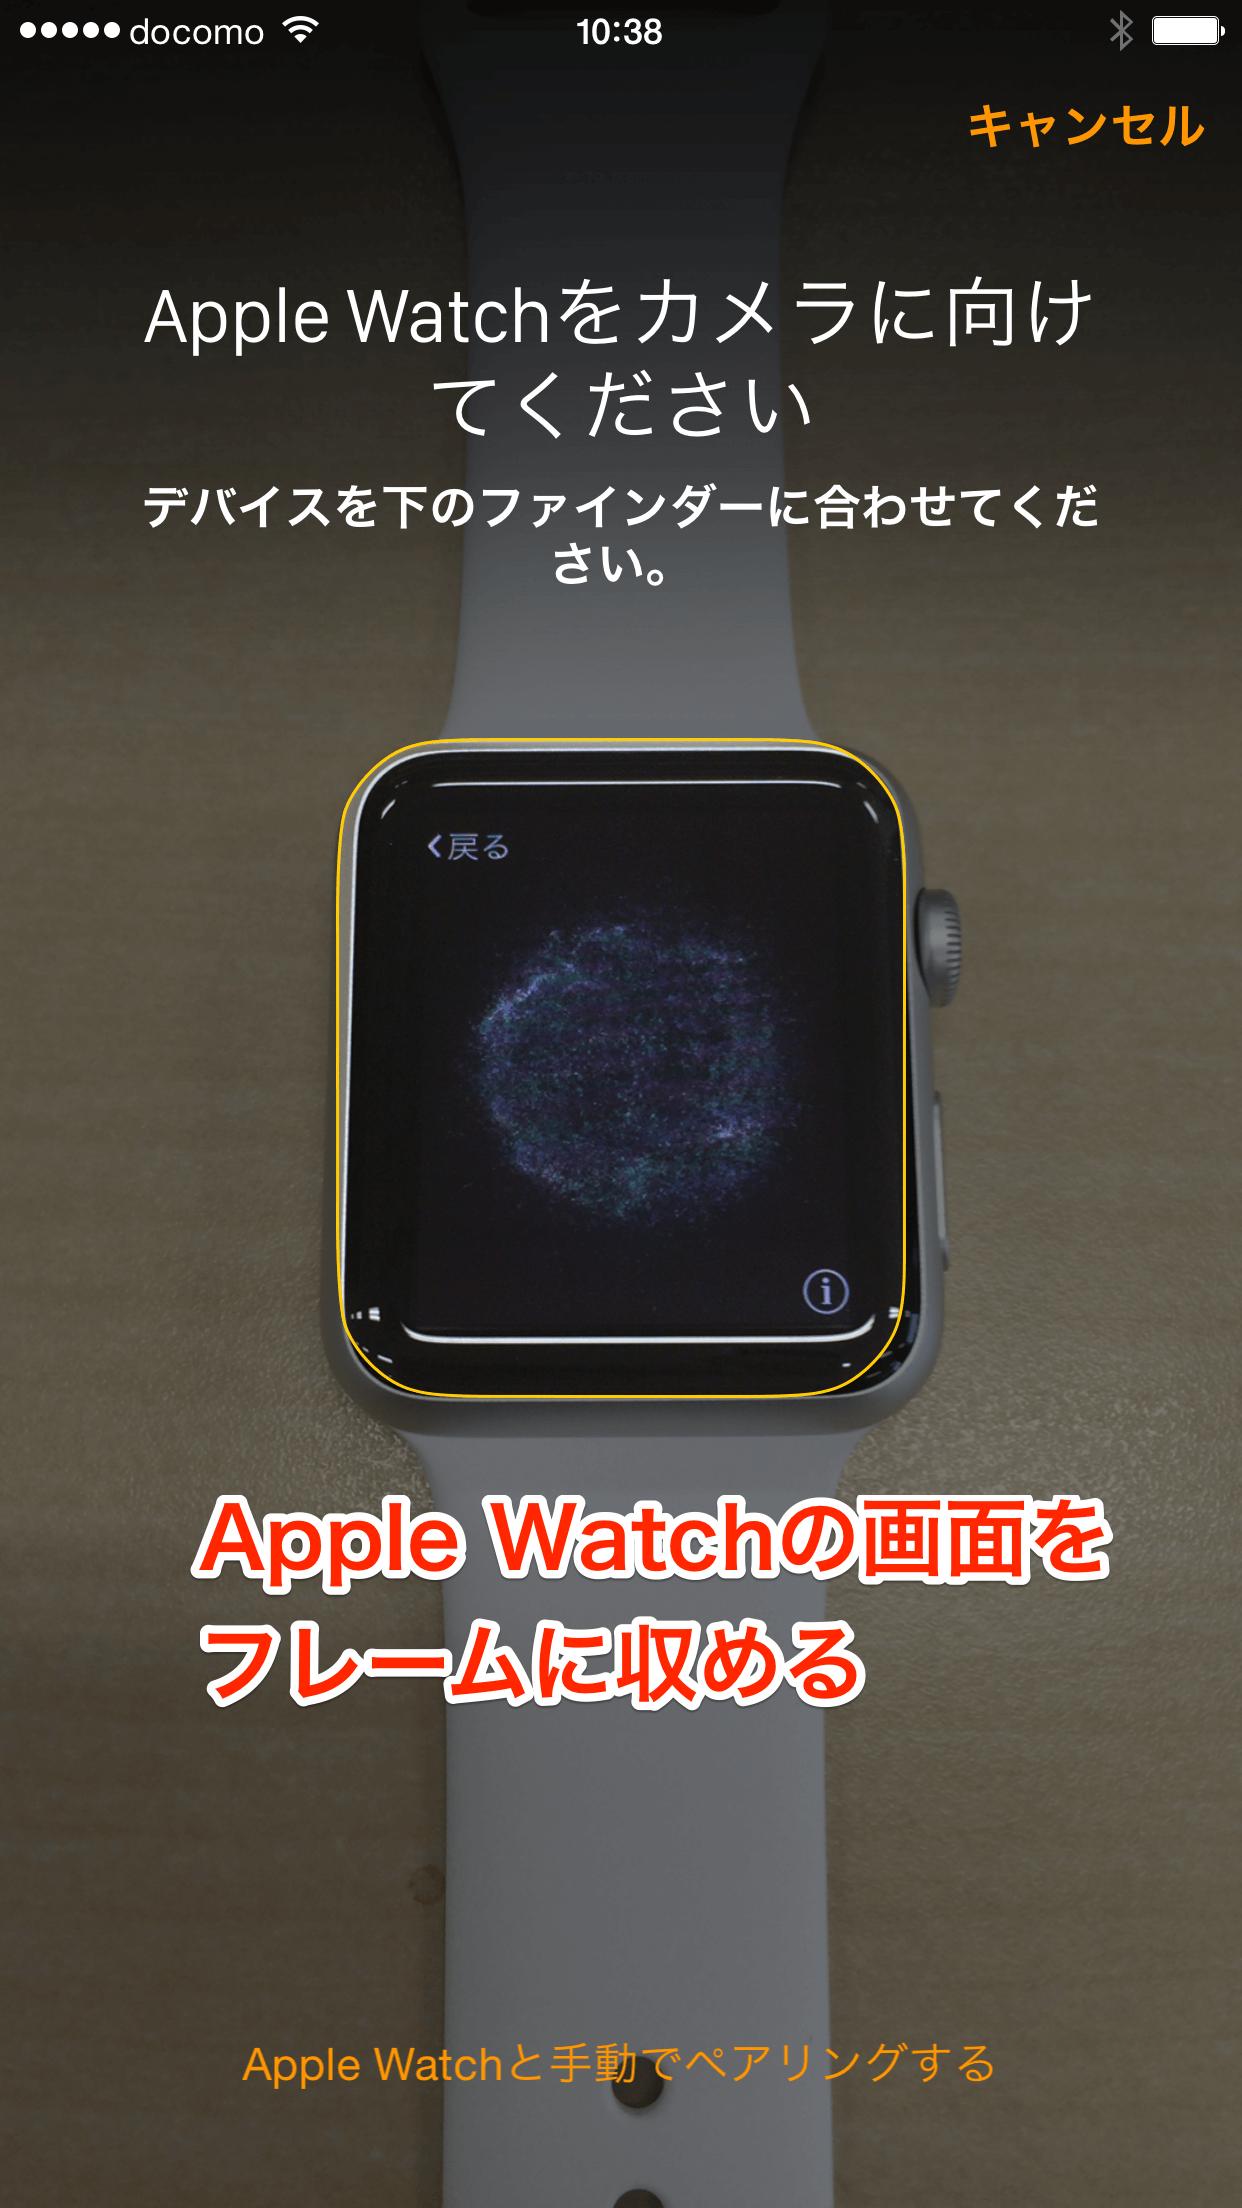 iPhoneのカメラをApple Watchに向ける